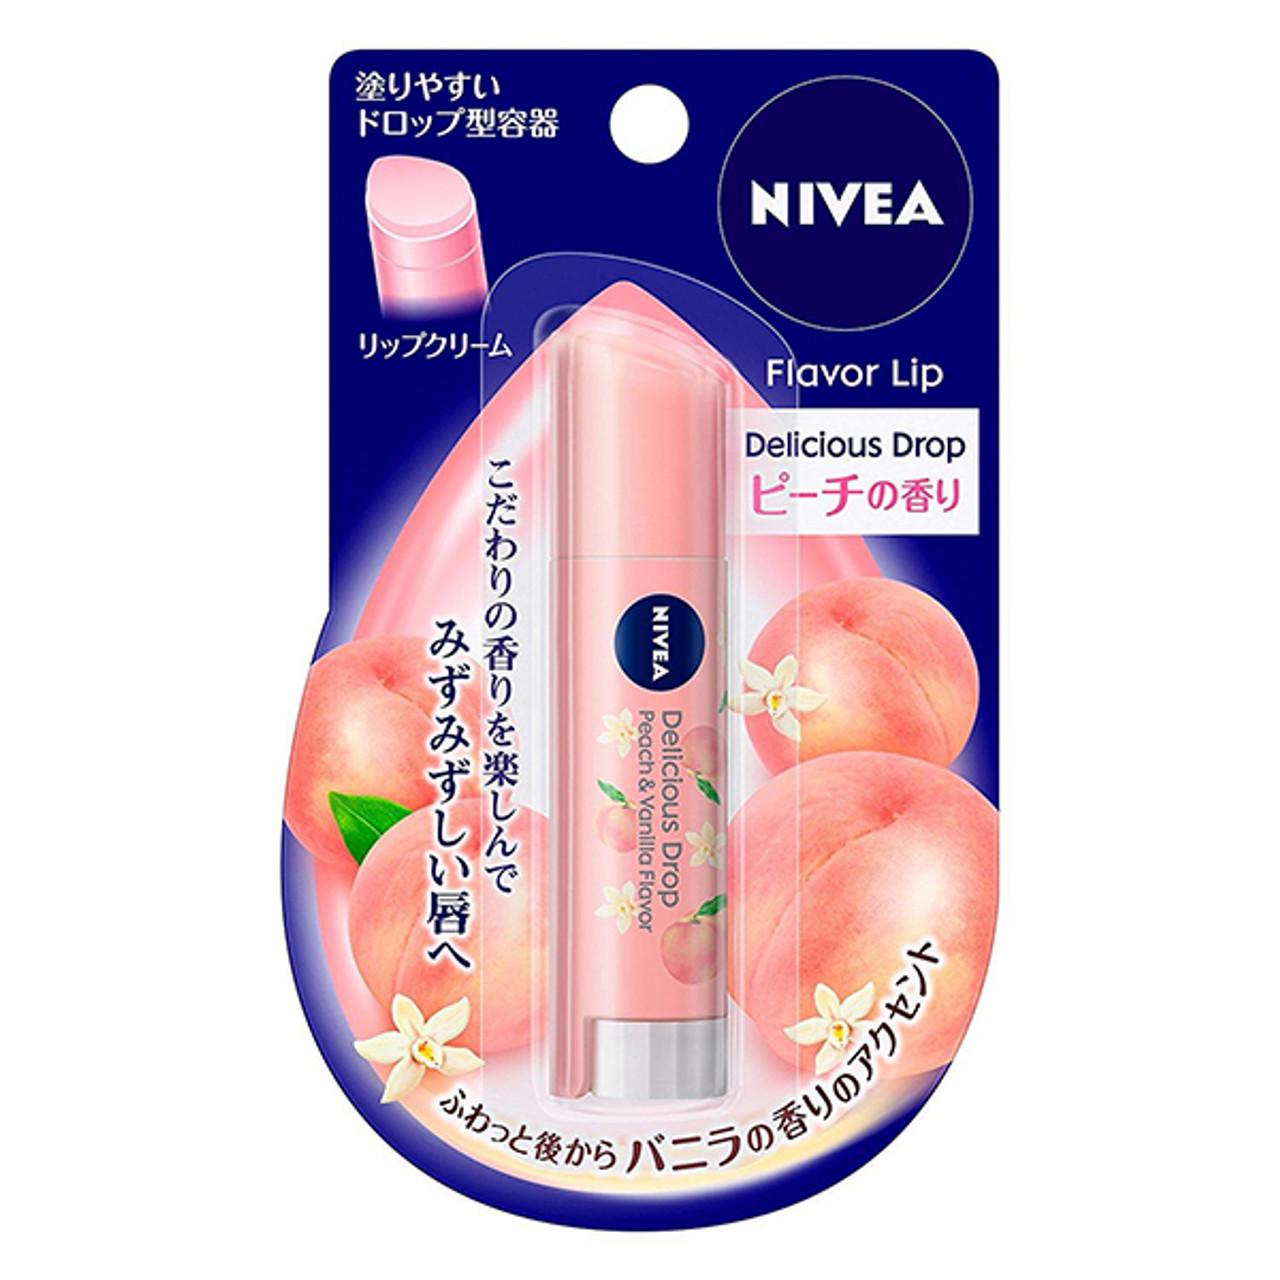 Nivea Delicious Drop Peach Lip Balm   果味潤唇膏蜜桃味SPF 11 3.5g - MikoPlace U.K.-  Premium Asian Product to U.K.